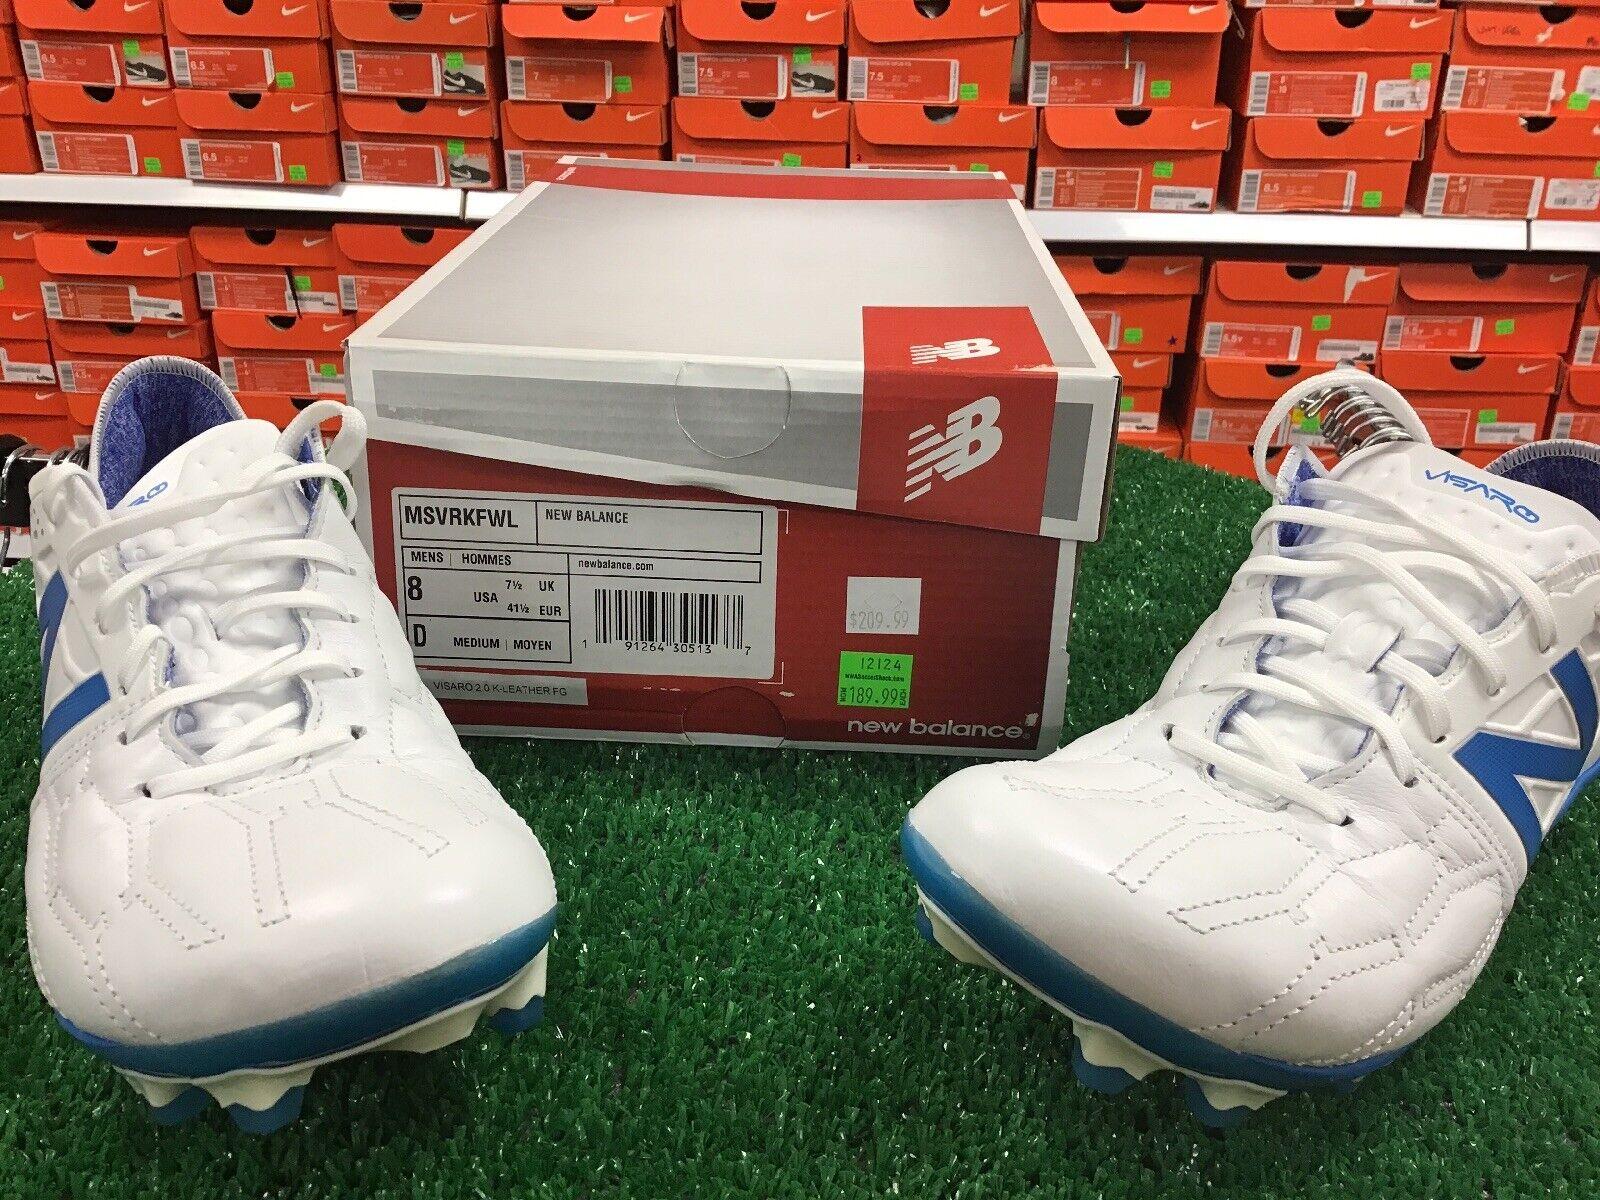 nuovo Balance Visaro 2.0 K Leather FG Soccer Cleats bianca Sz 8 Kangaroo